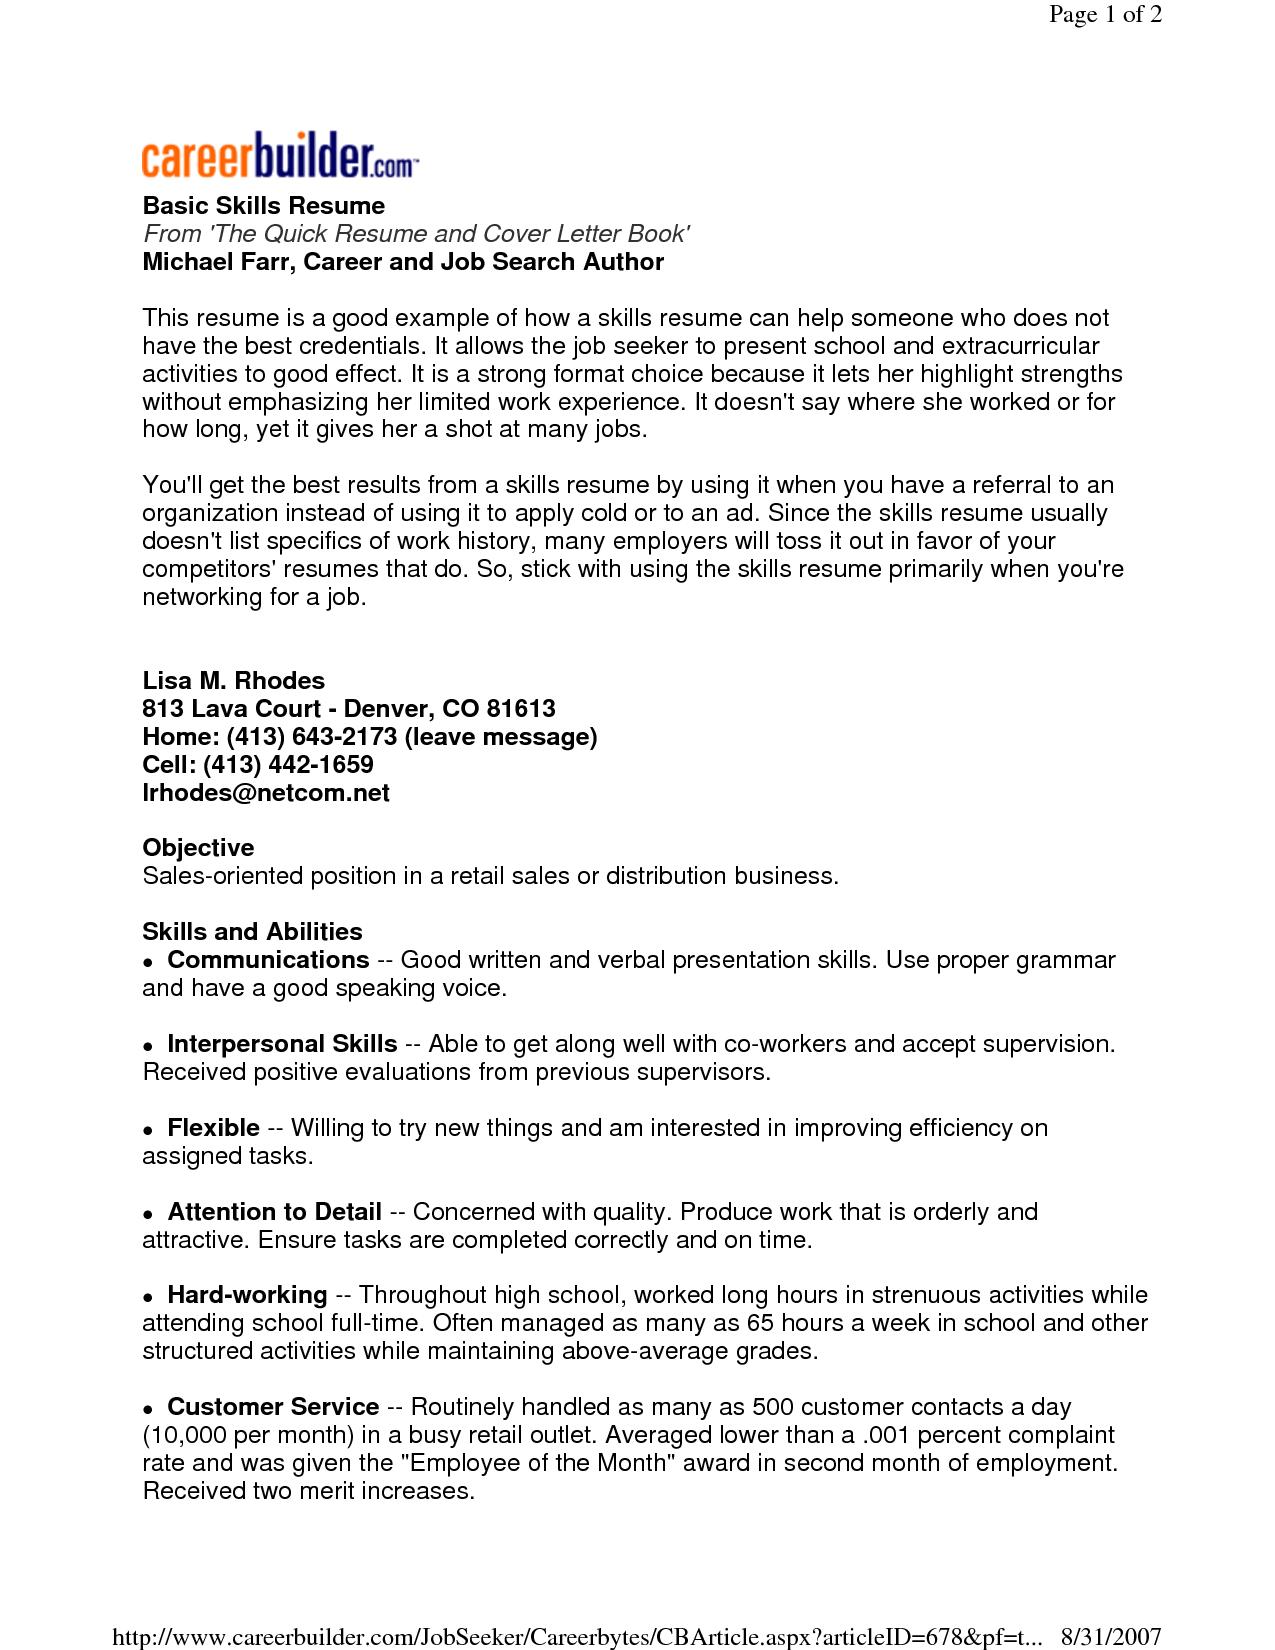 Best Resume Writing Books